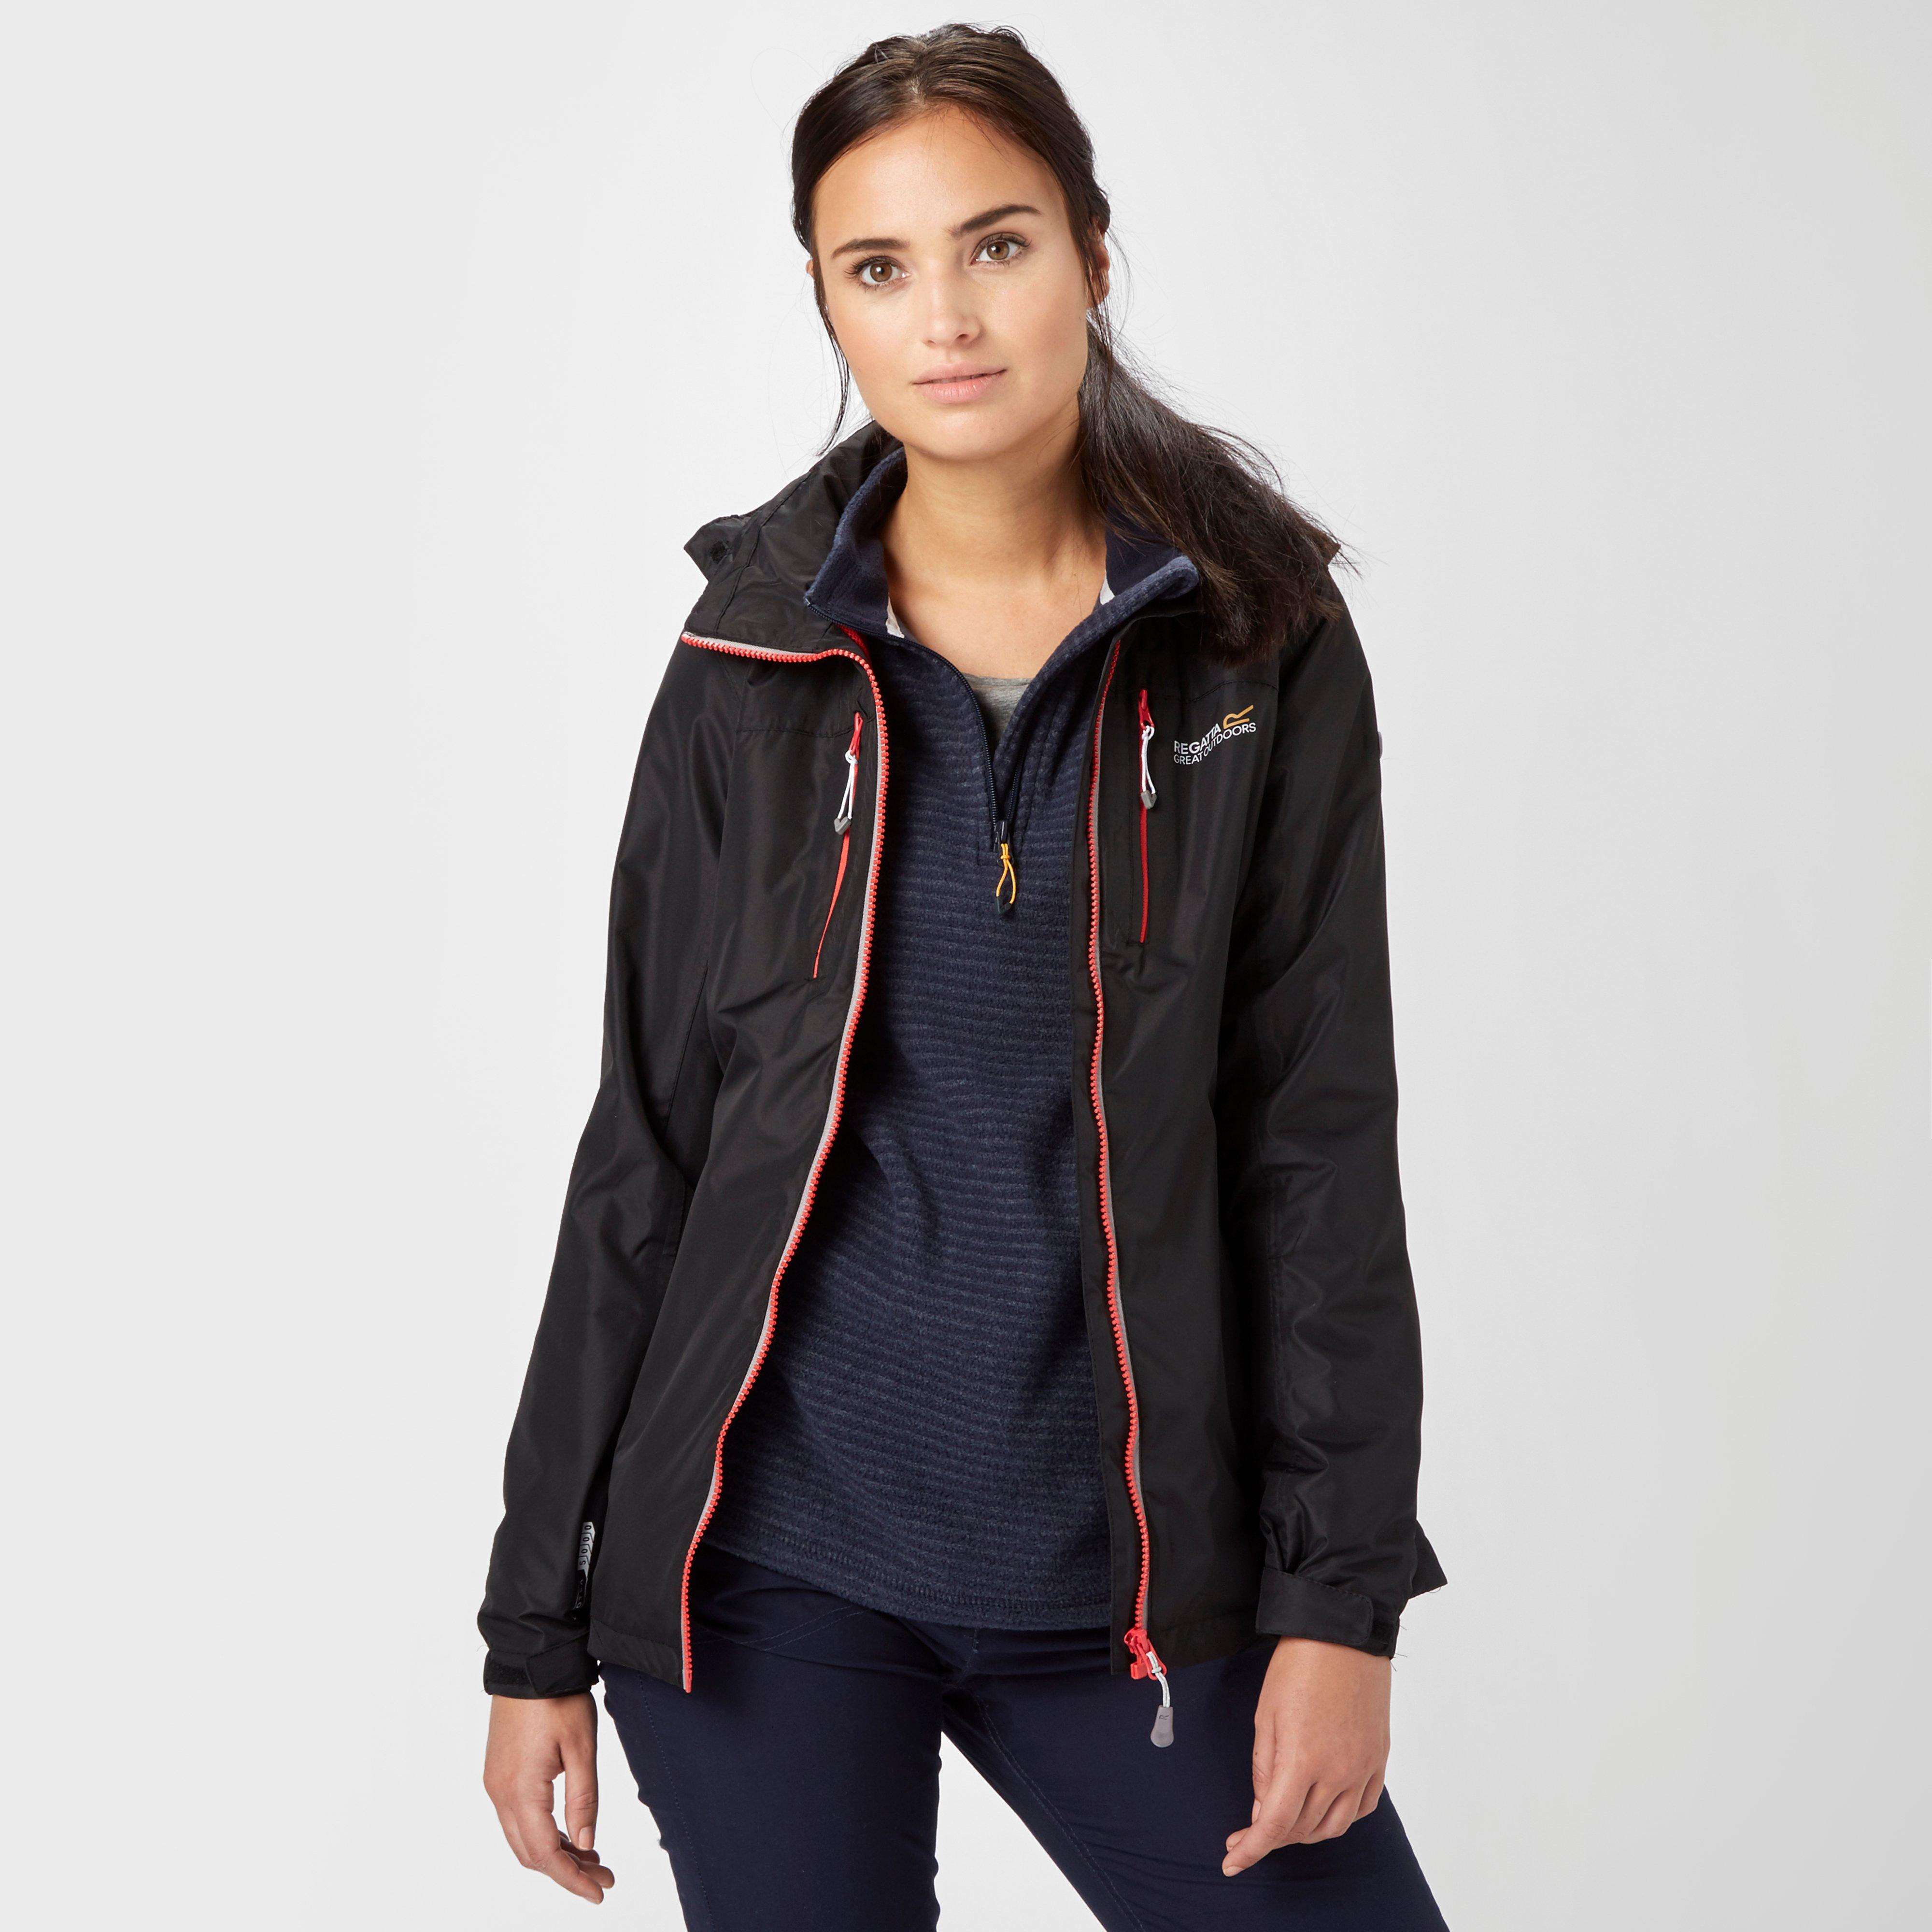 Regatta Womens Calderdale II Jacket Black